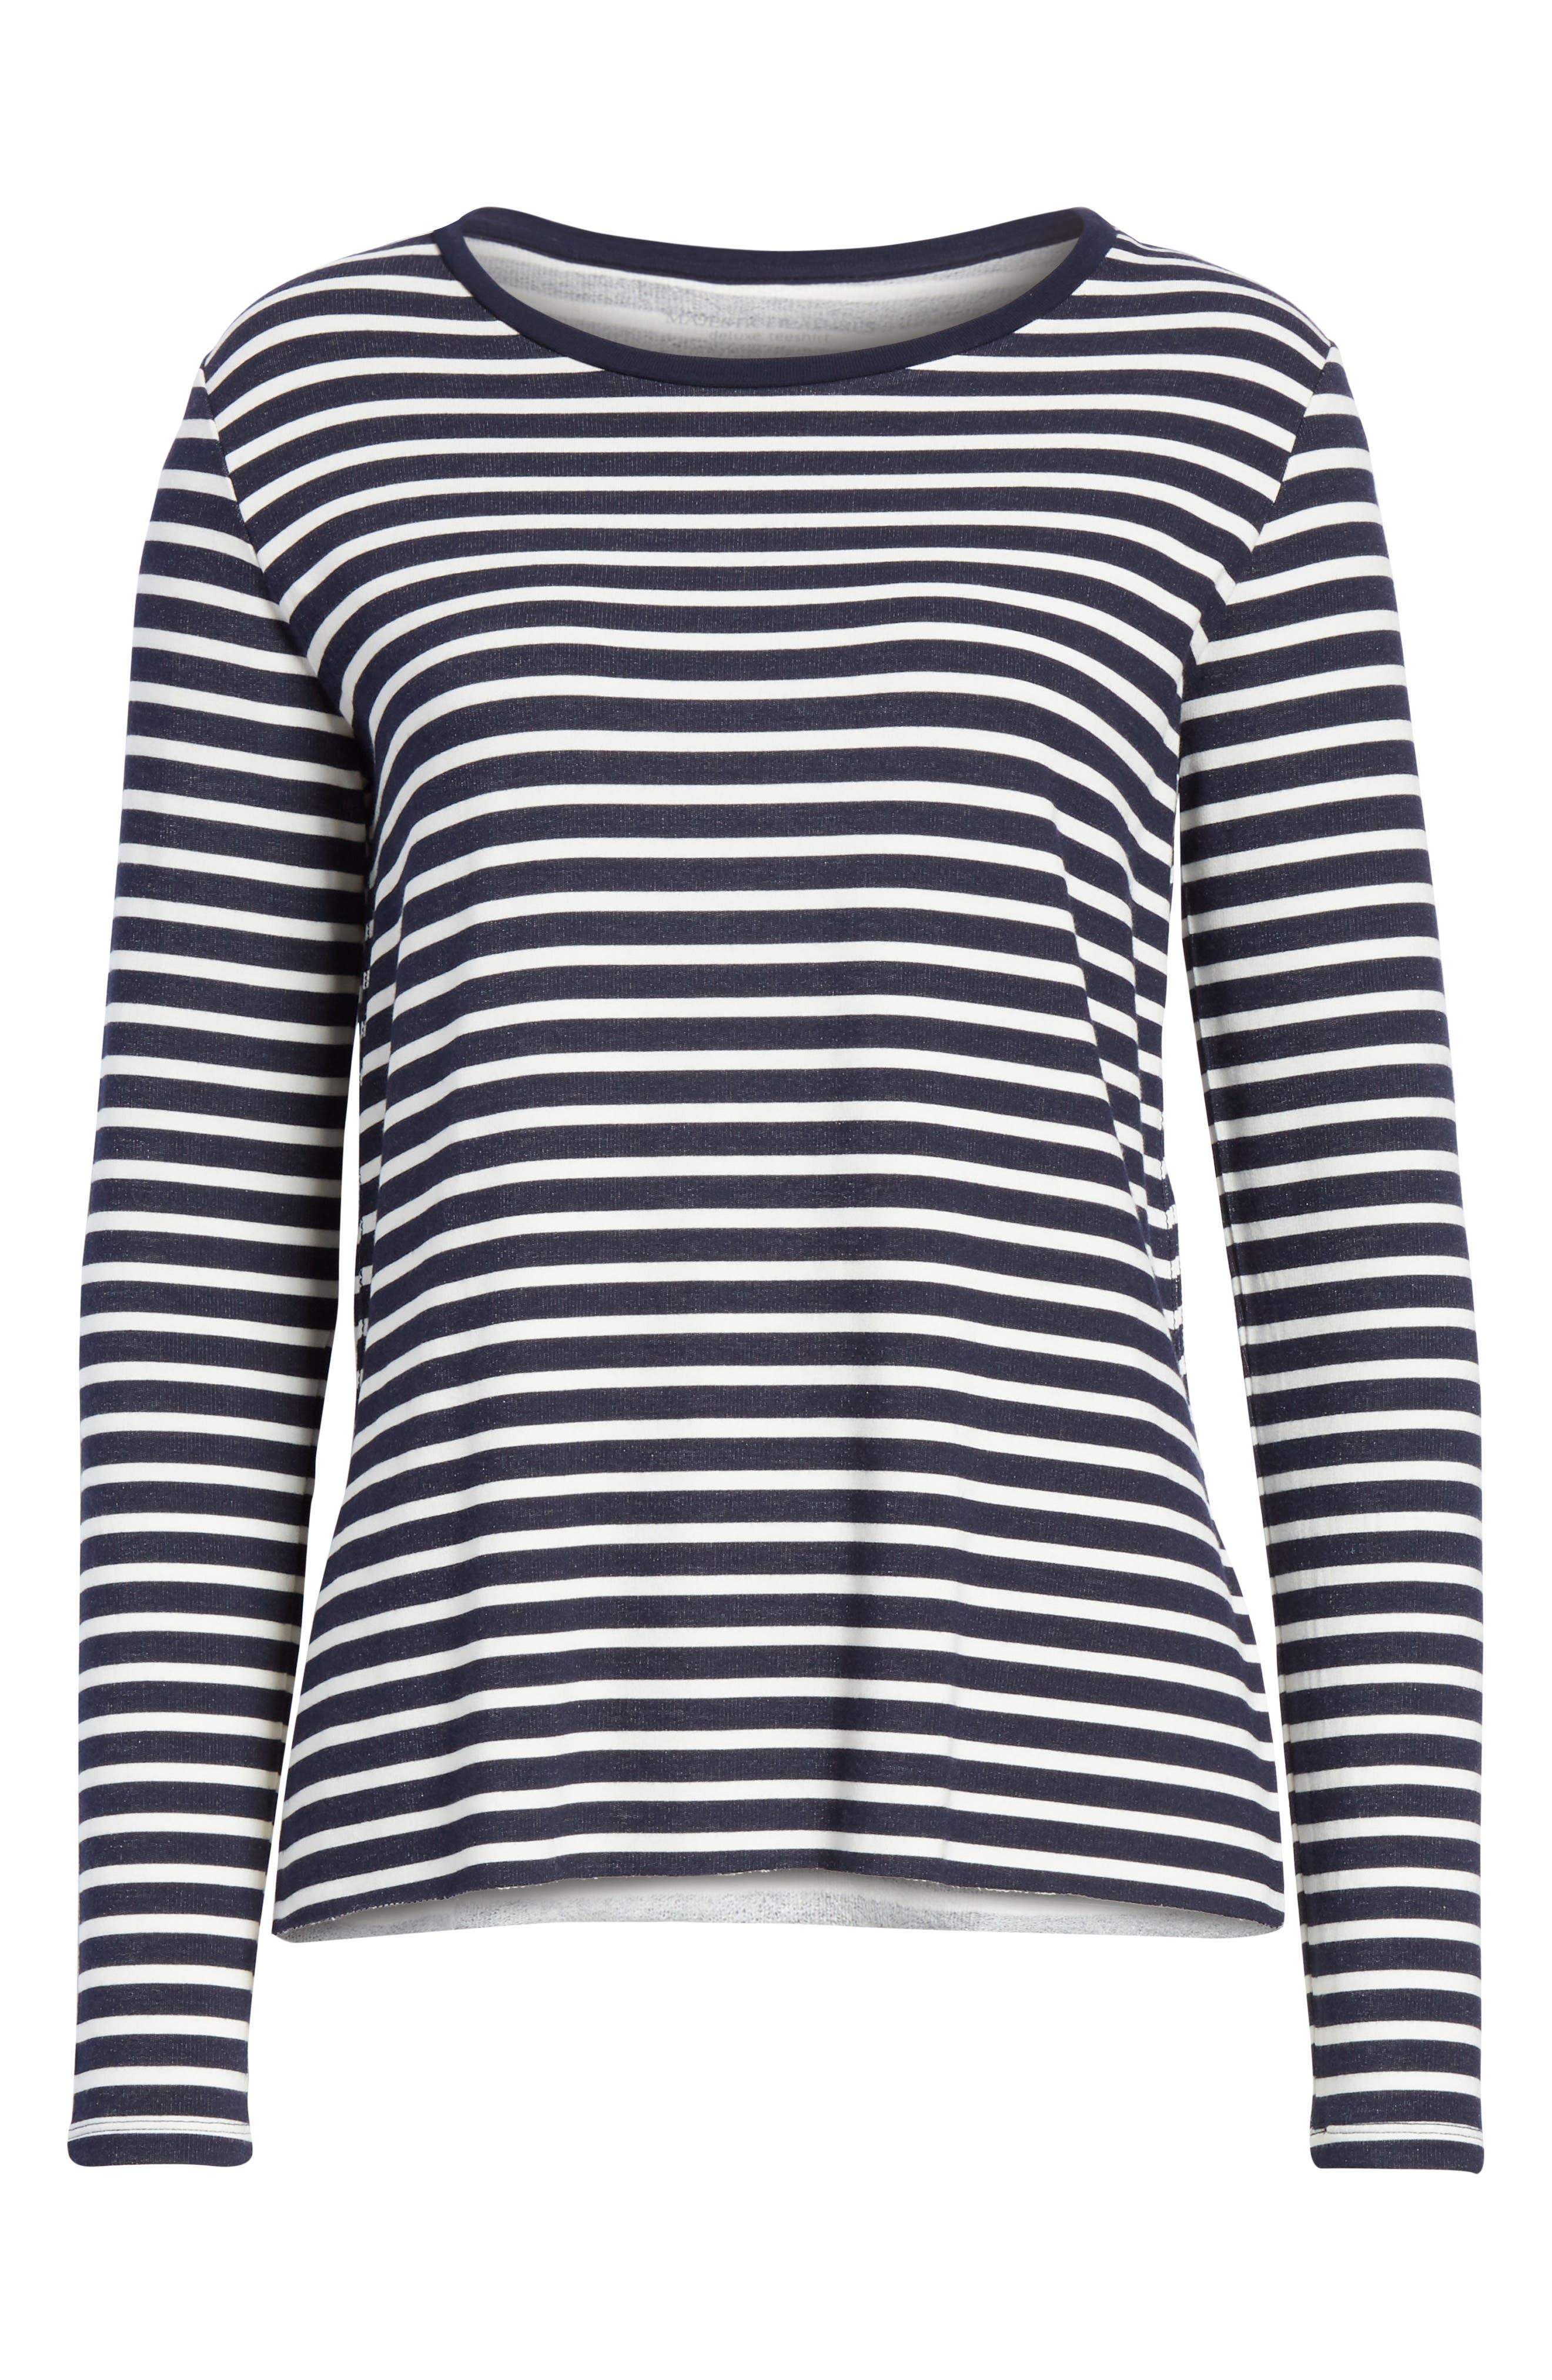 Stripe Sweatshirt,                             Alternate thumbnail 6, color,                             Marine/ Milk